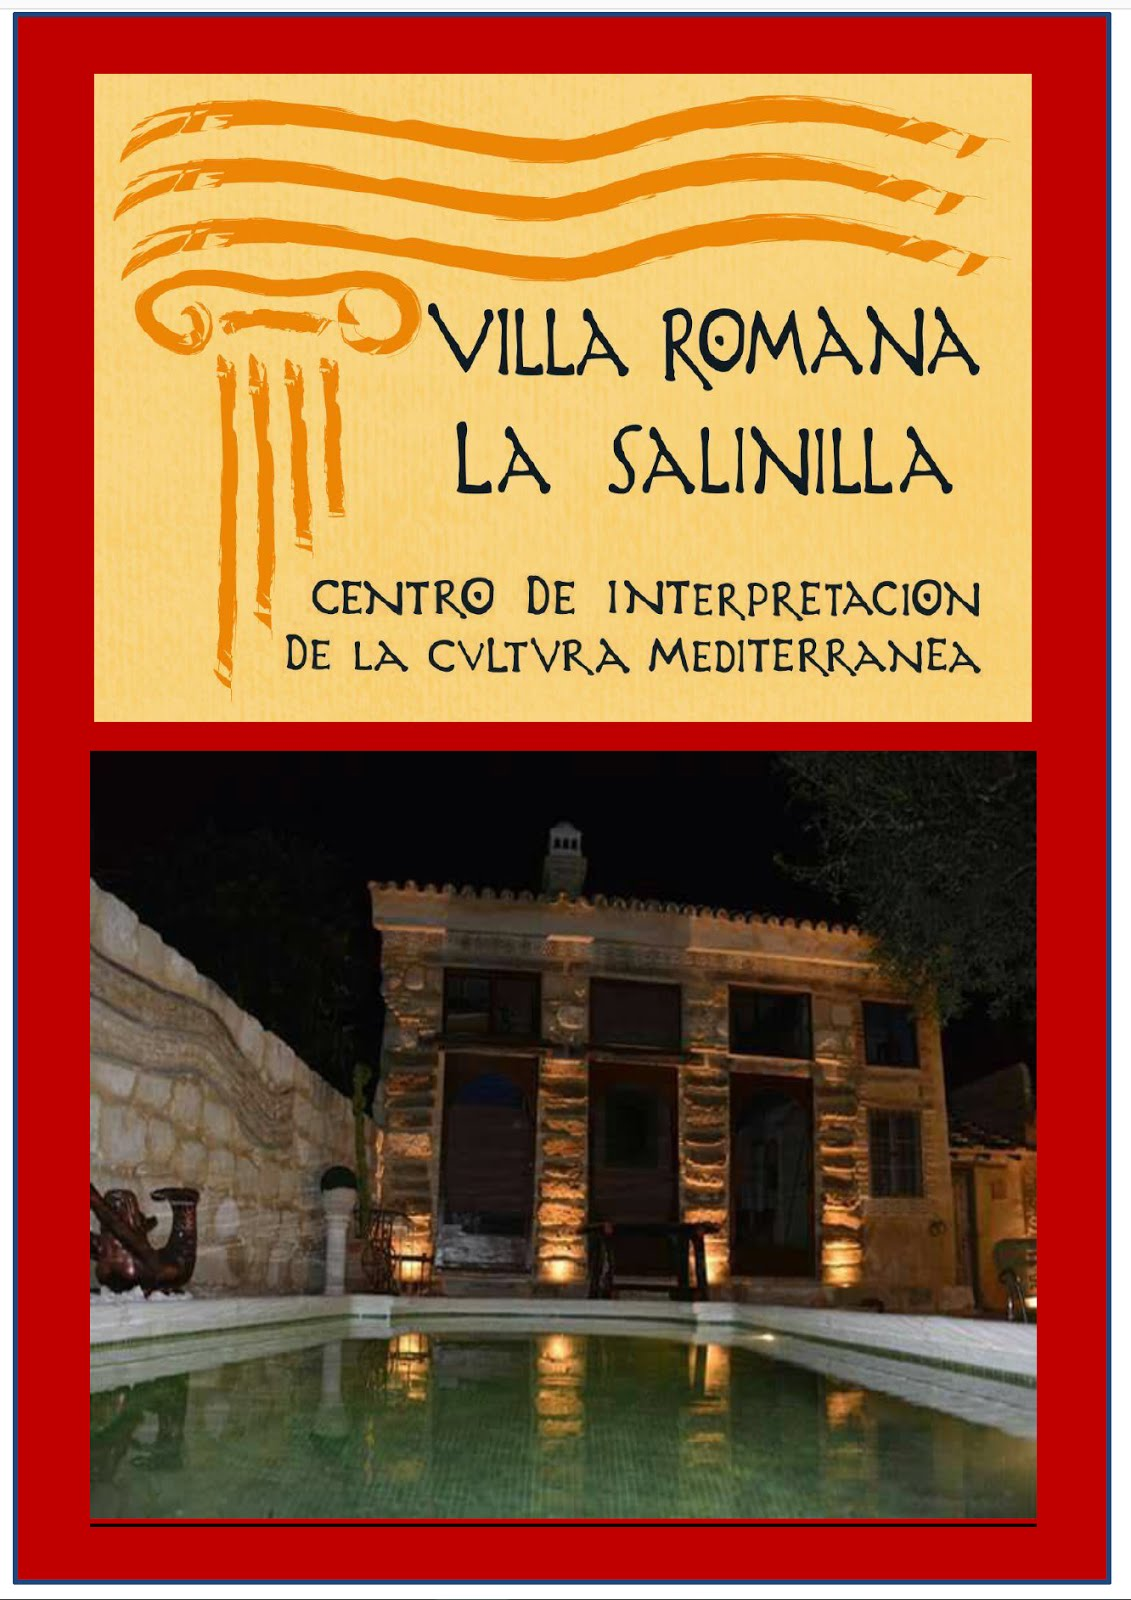 Villa romana 'La Salinilla'